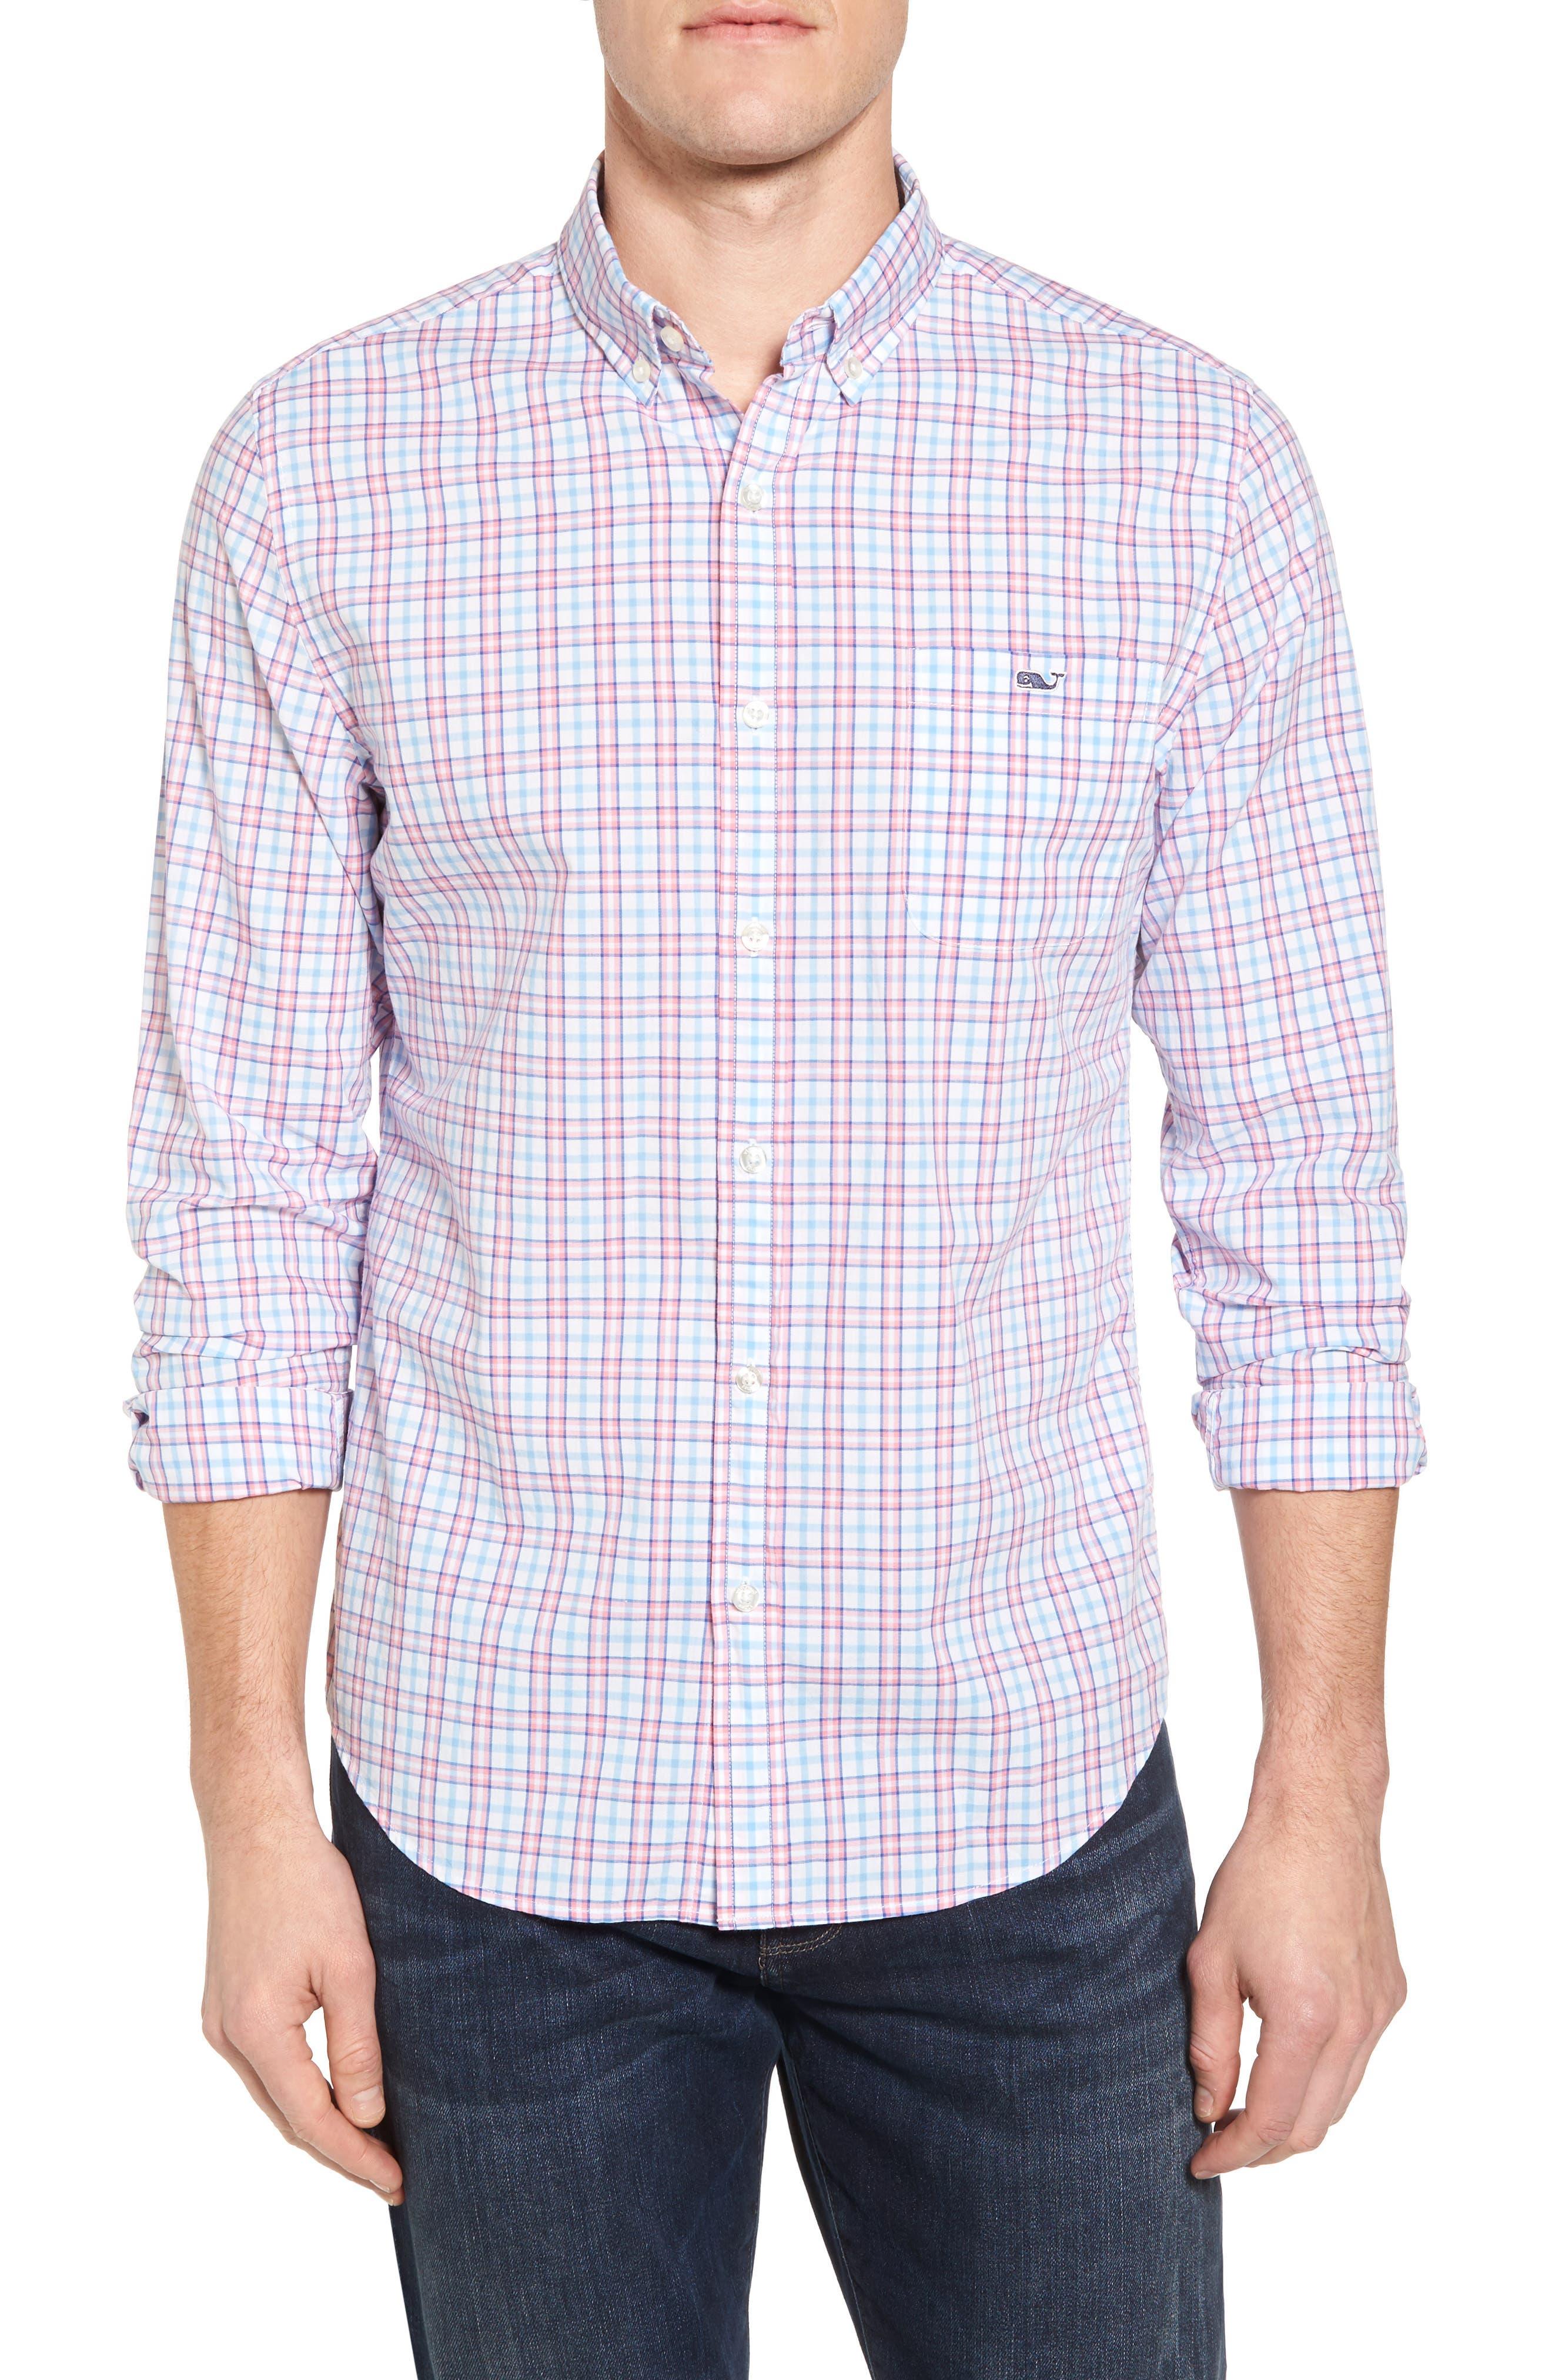 Kennard Tucker Slim Fit Plaid Sport Shirt,                             Main thumbnail 1, color,                             956